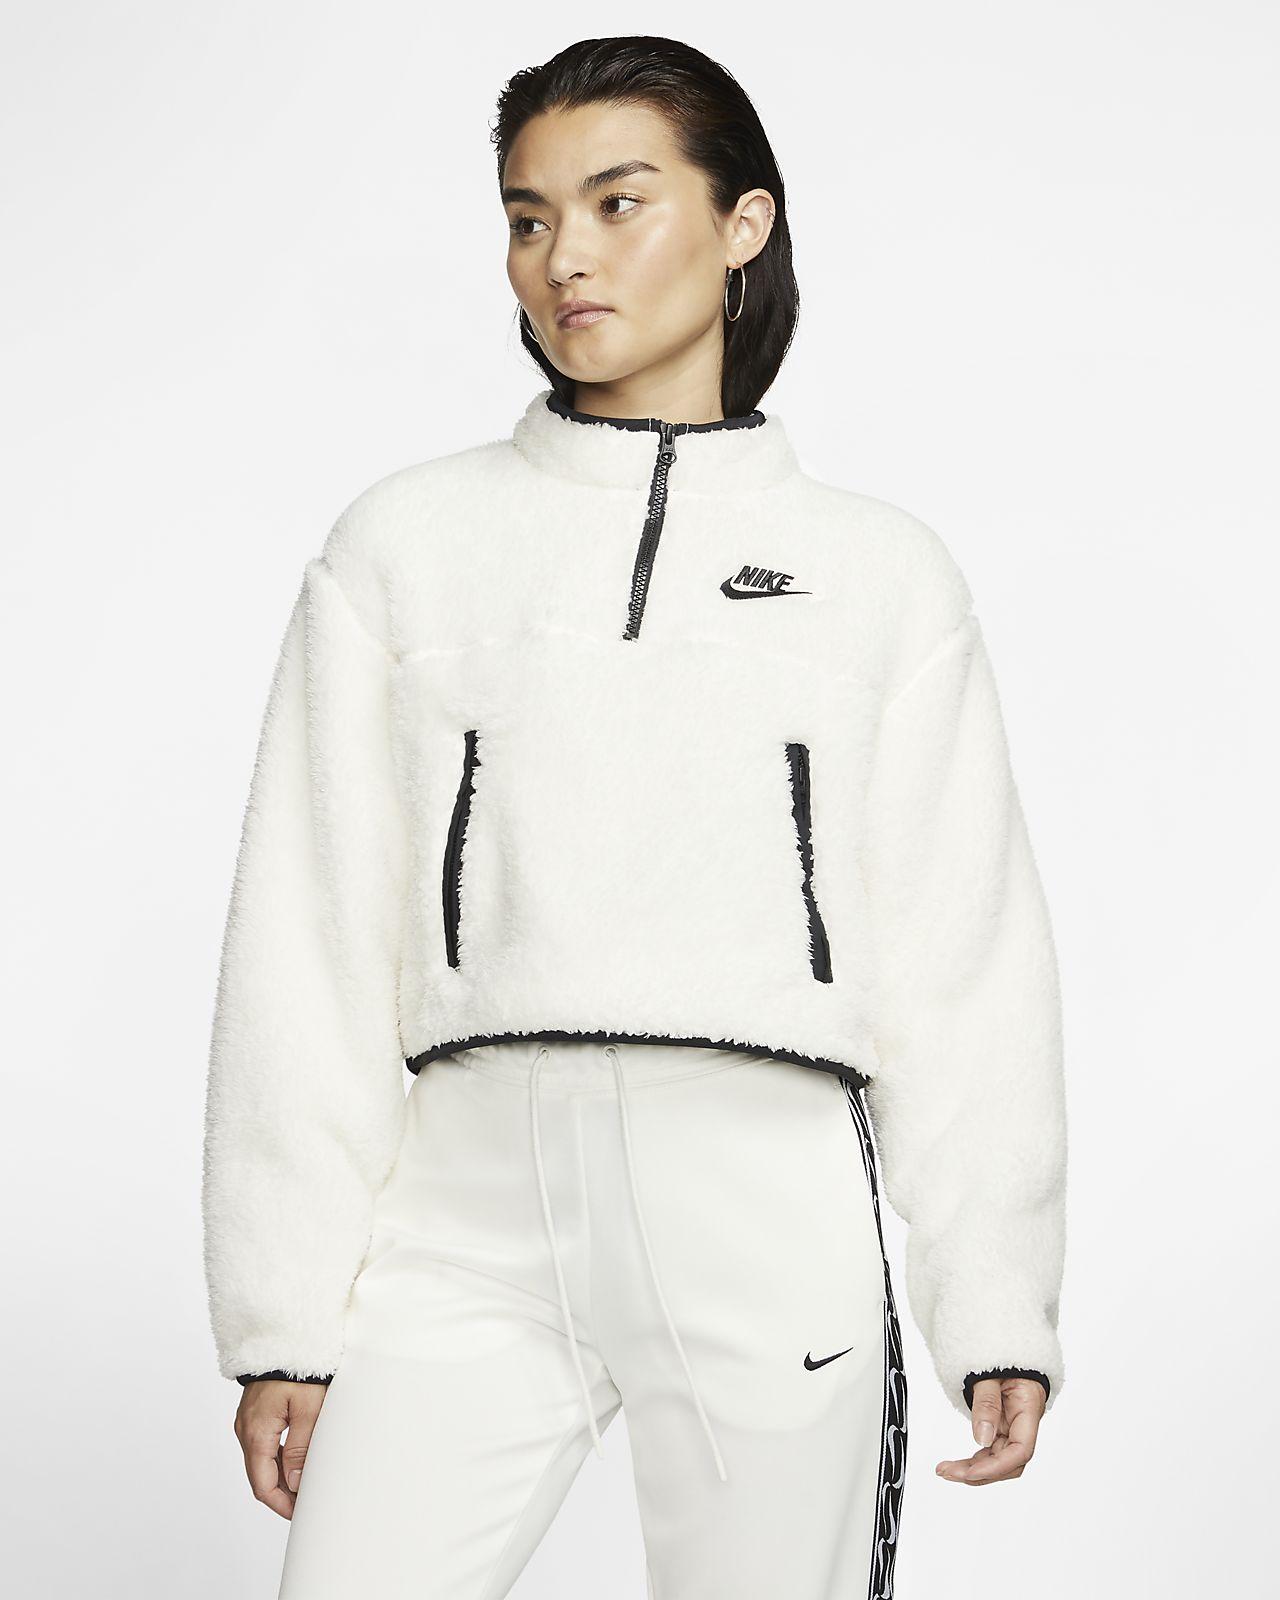 Женская укороченная футболка из флиса Sherpa с молнией 1/4 Nike Sportswear